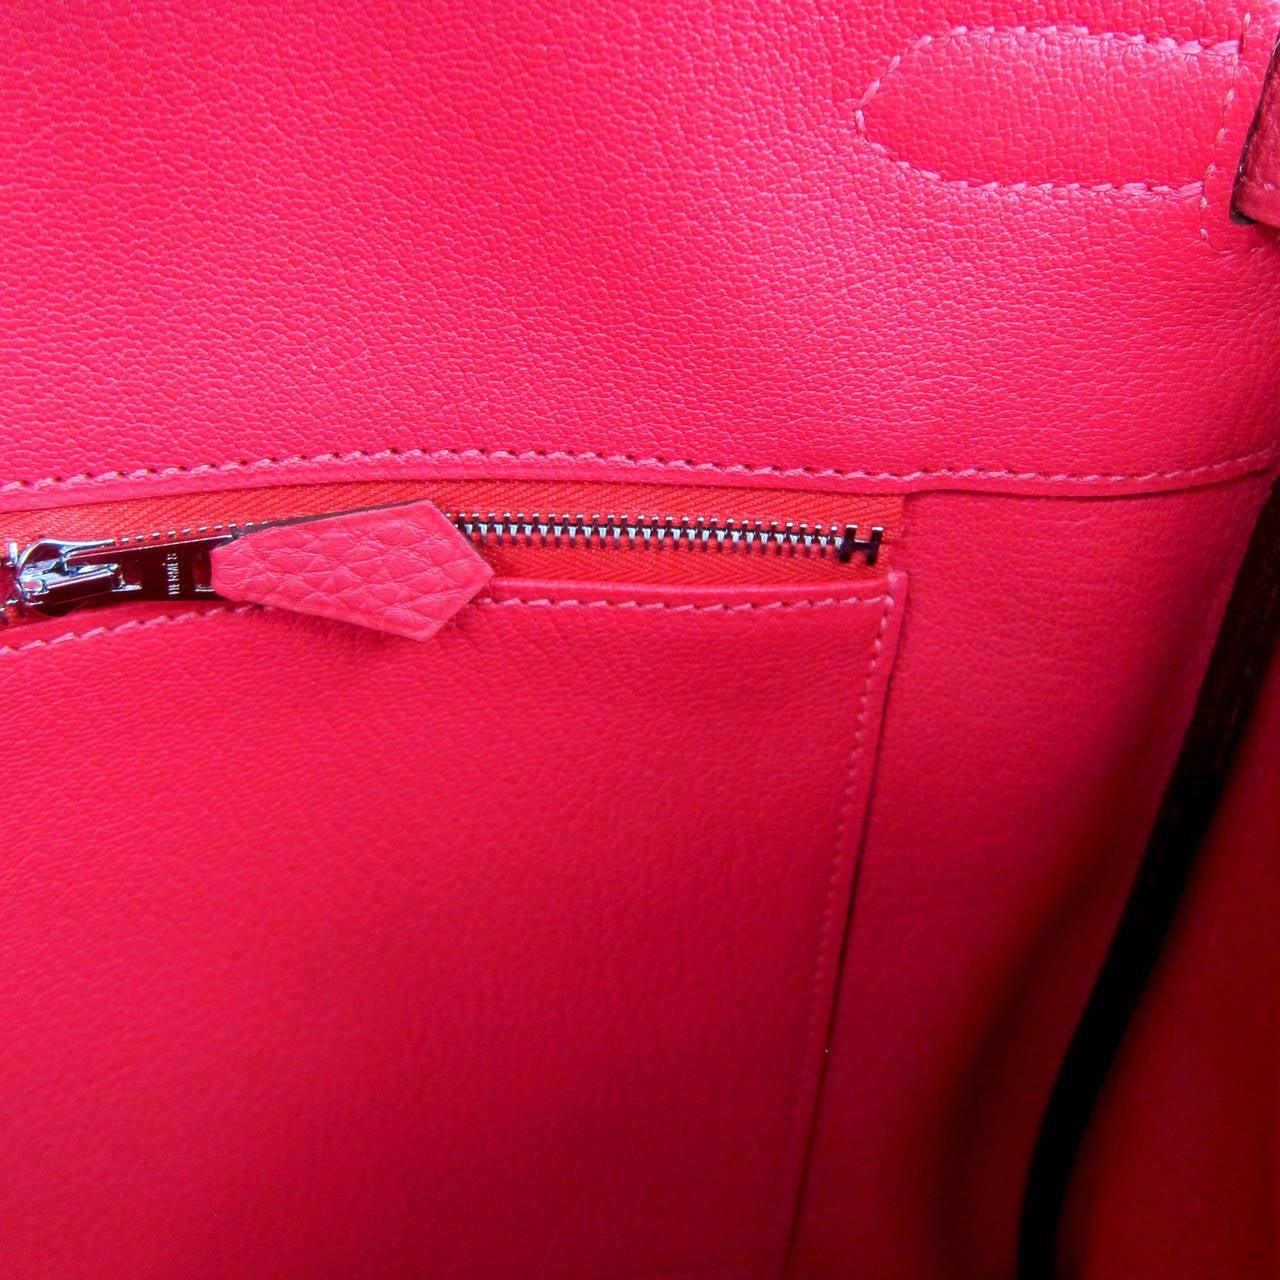 Hermes Rouge Pivoine 40cm Togo Birkin Bag Palladium Luscious For Sale 4